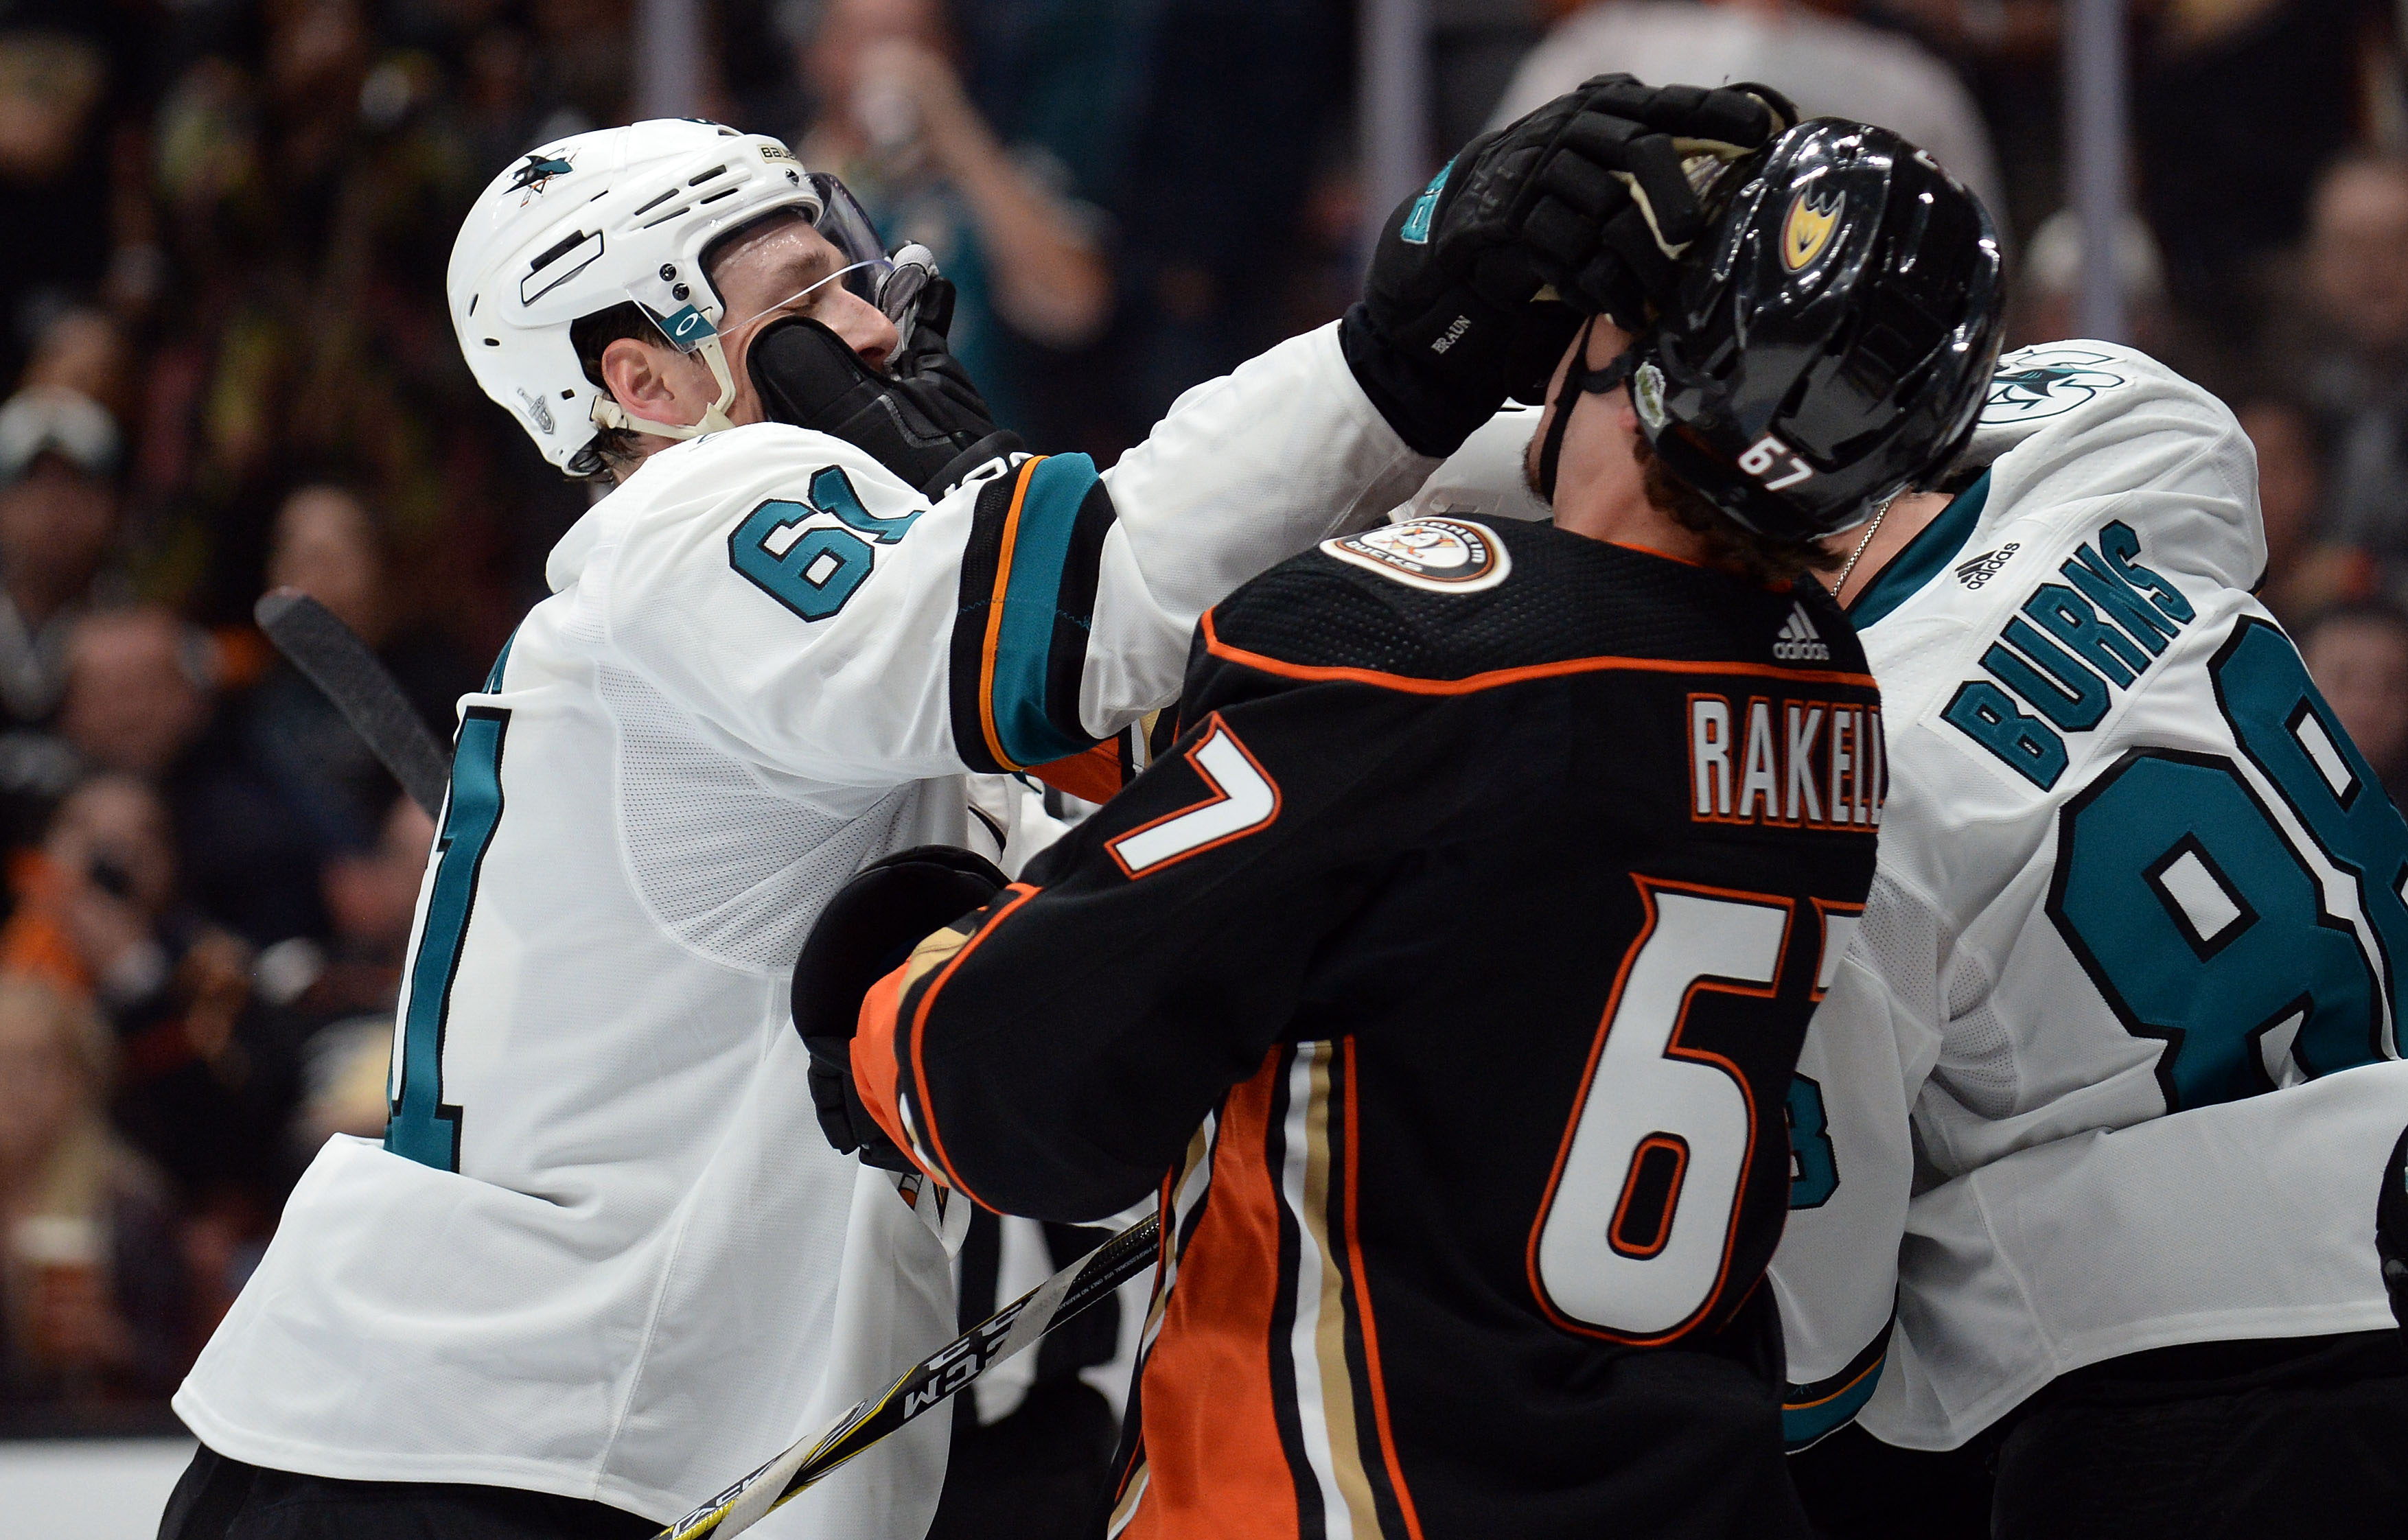 Apr 12, 2018; Anaheim, CA, USA; San Jose Sharks defenseman Justin Braun  (61) hits Anaheim Ducks center Rickard Rakell (67) during the second  period in game one of the first round of the 2018 Stanley Cup Playoffs  at Honda Center.